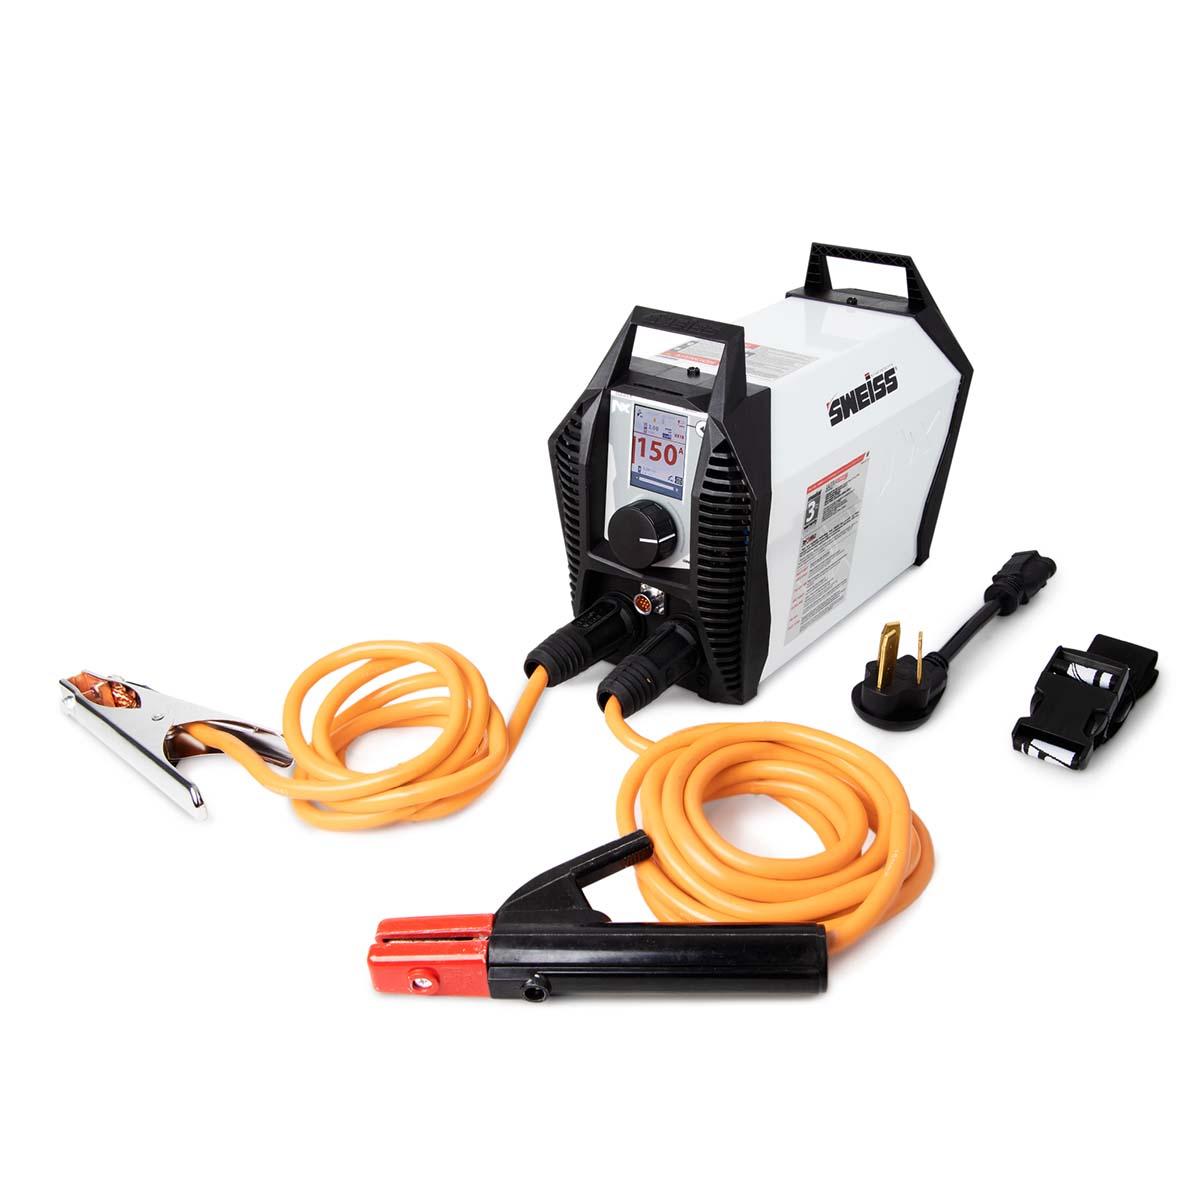 Soldadora Inversora Inverter 150AMP 110V-220V Pantalla Color